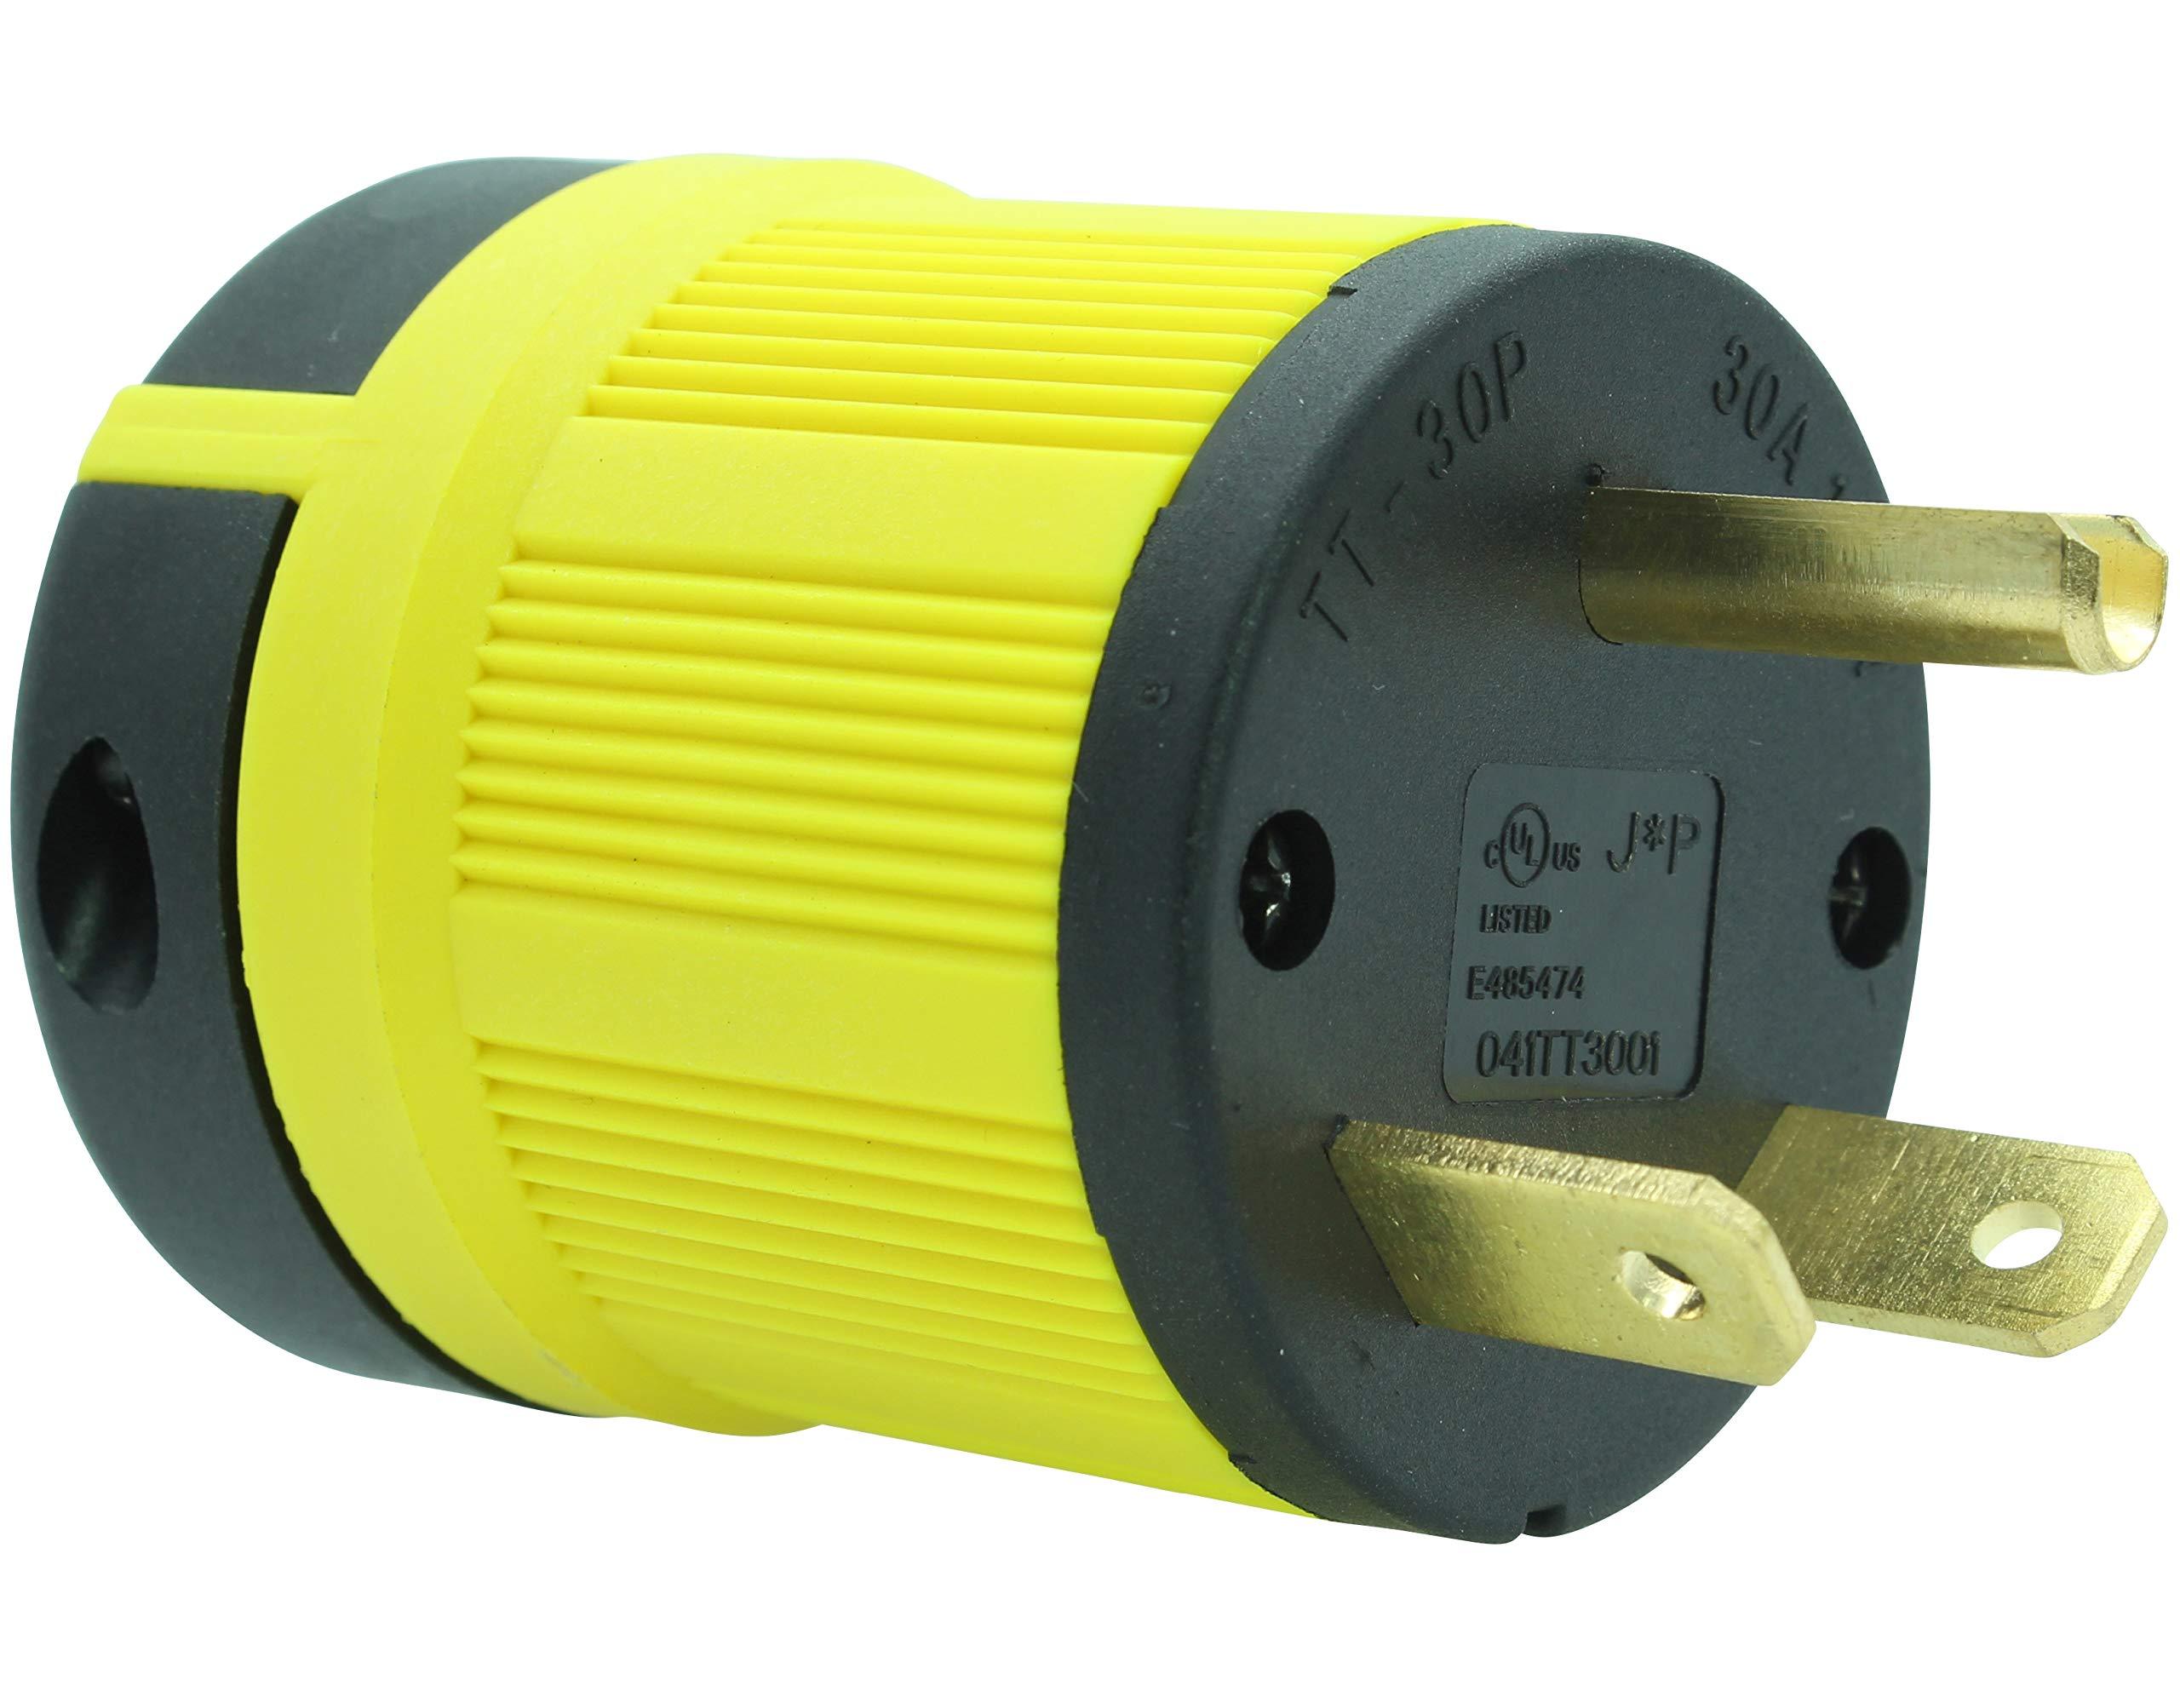 Journeyman-Pro NEMA TT-30P, 30 Amp, 125 Volt, Straight Blade Male RV Trailer Plug Connector, Black/Yellow Industrial Grade, Grounding 3750 Watts Generator TT30 (TT30P+TT30R COMBO YLW)